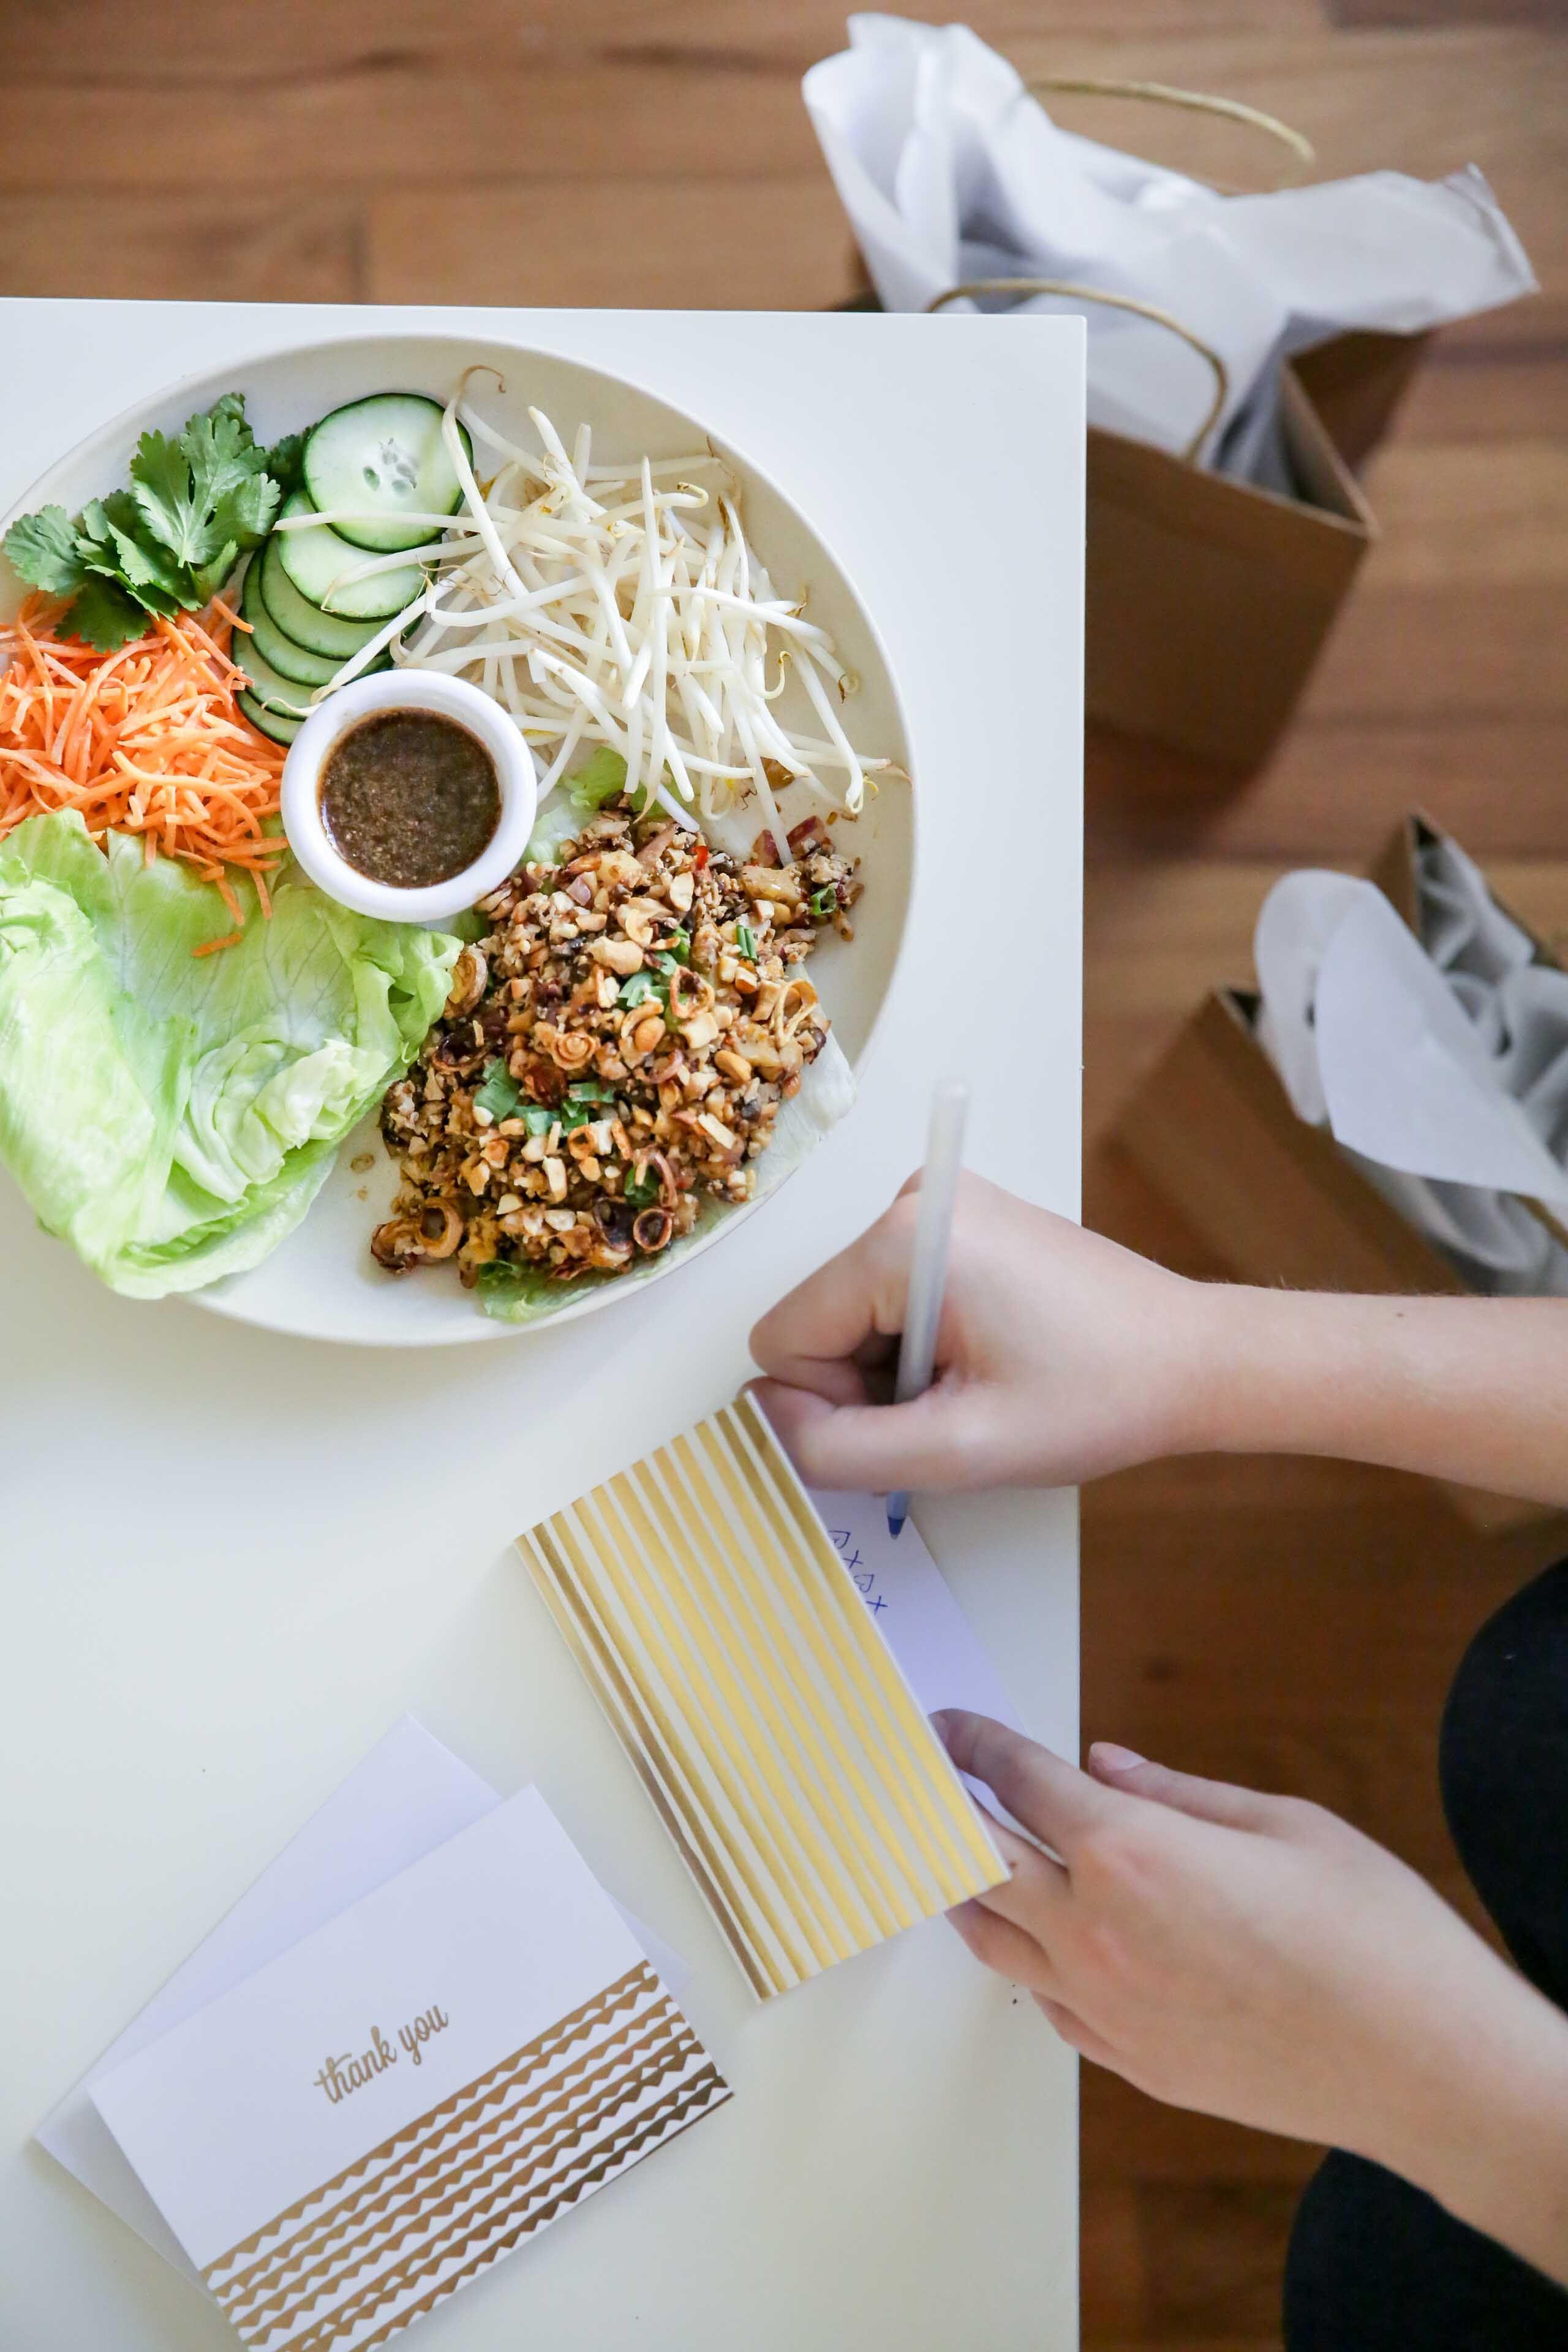 Southeast Asian Lettuce Wraps Vegan Gf Delicious Vegetarian Grilled Veggies Asian Lettuce Wraps